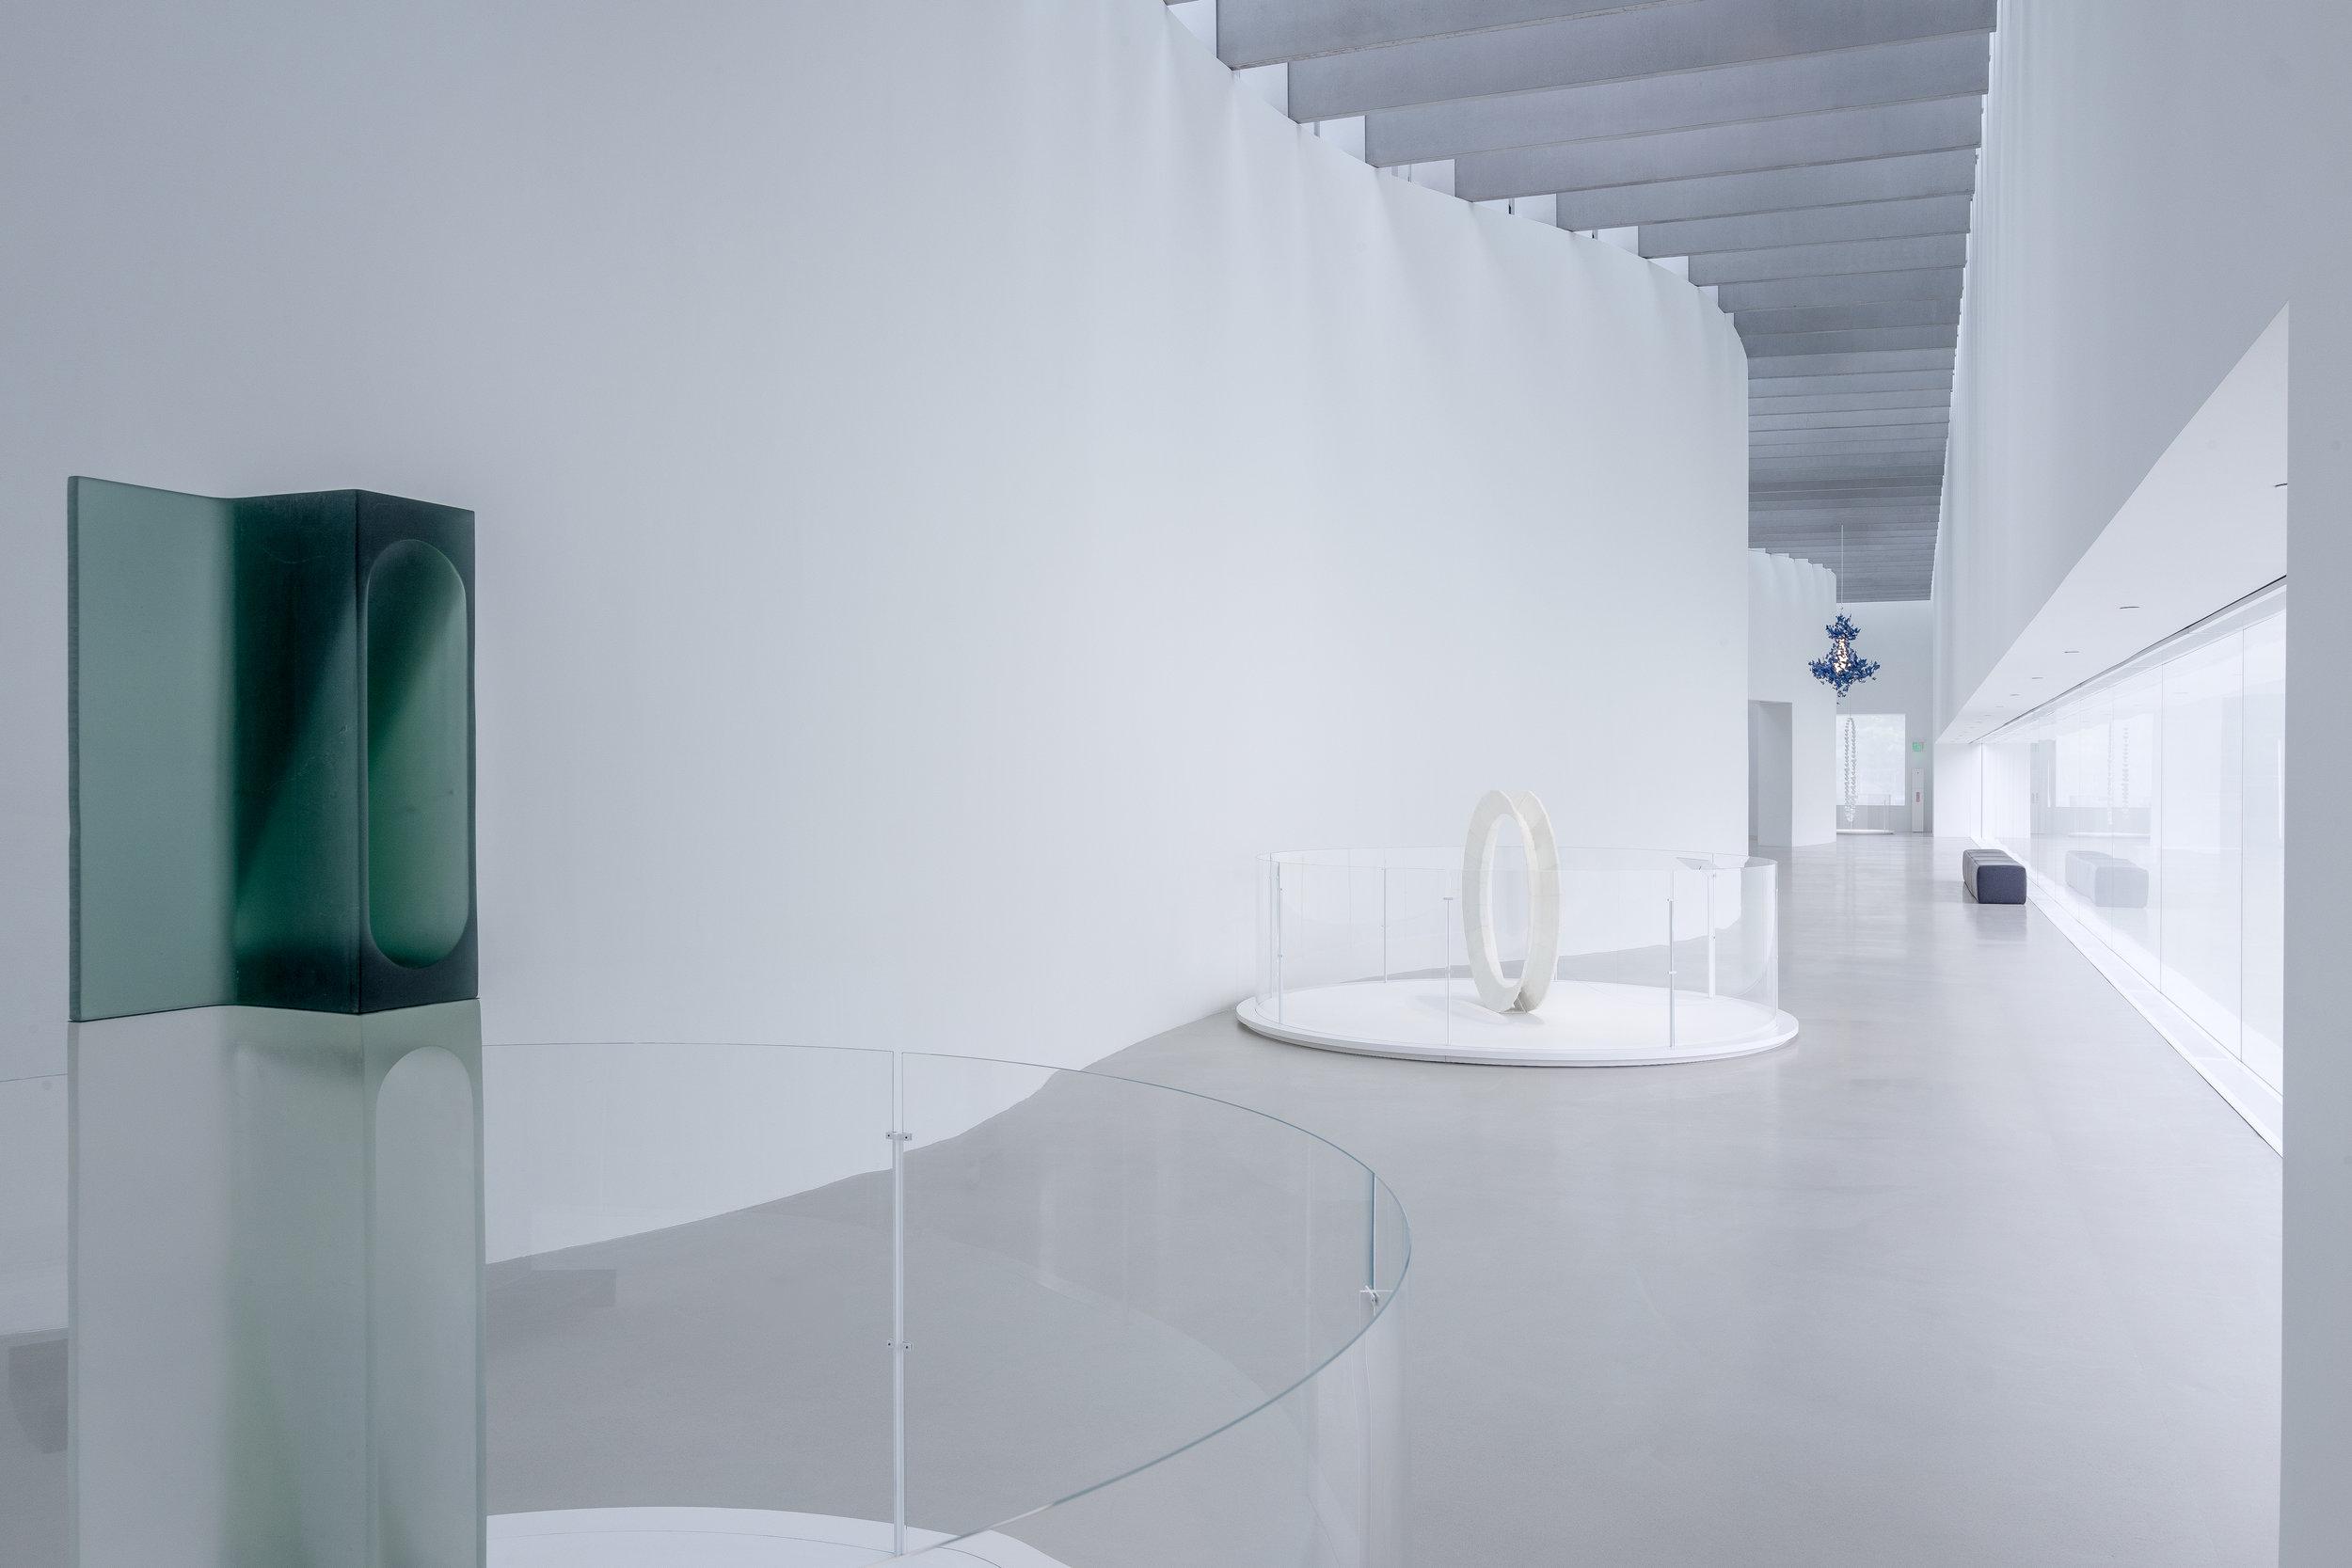 ramsey bakhoum - architectural photographer - corning museum (1 of 1)-4.jpg